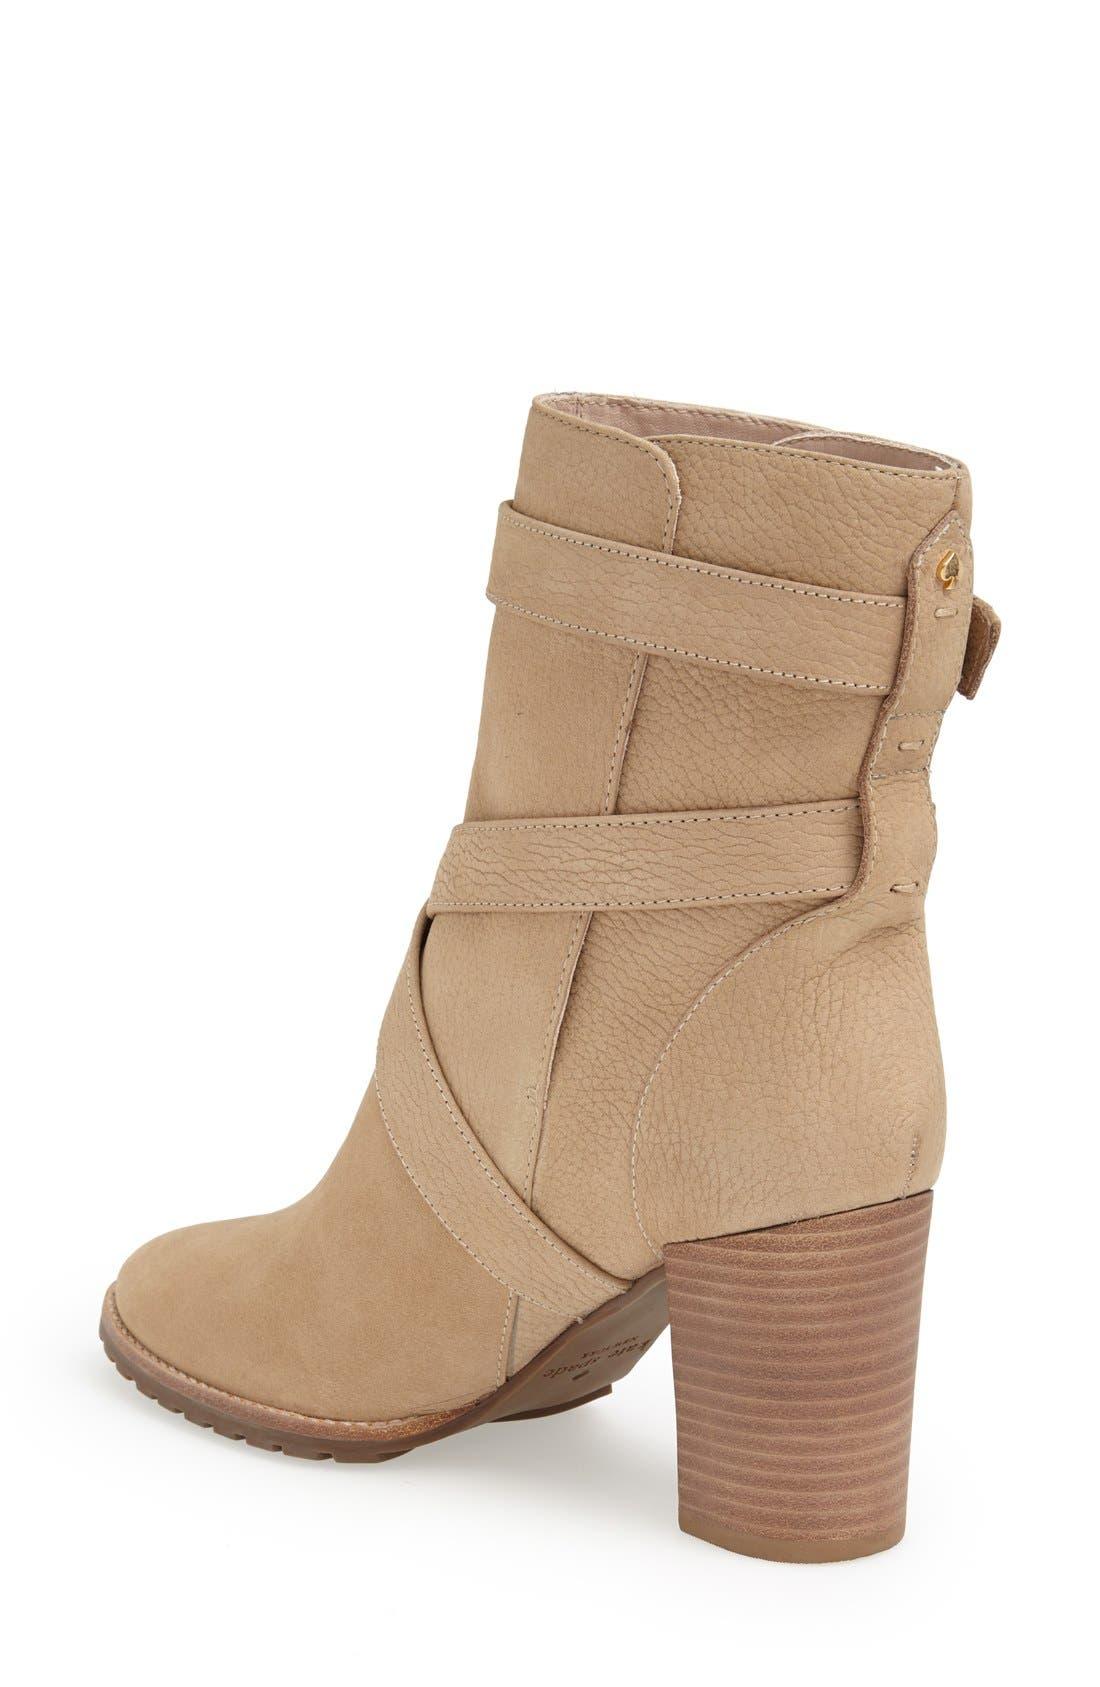 Alternate Image 2  - kate spade new york 'layne' boot (Women)